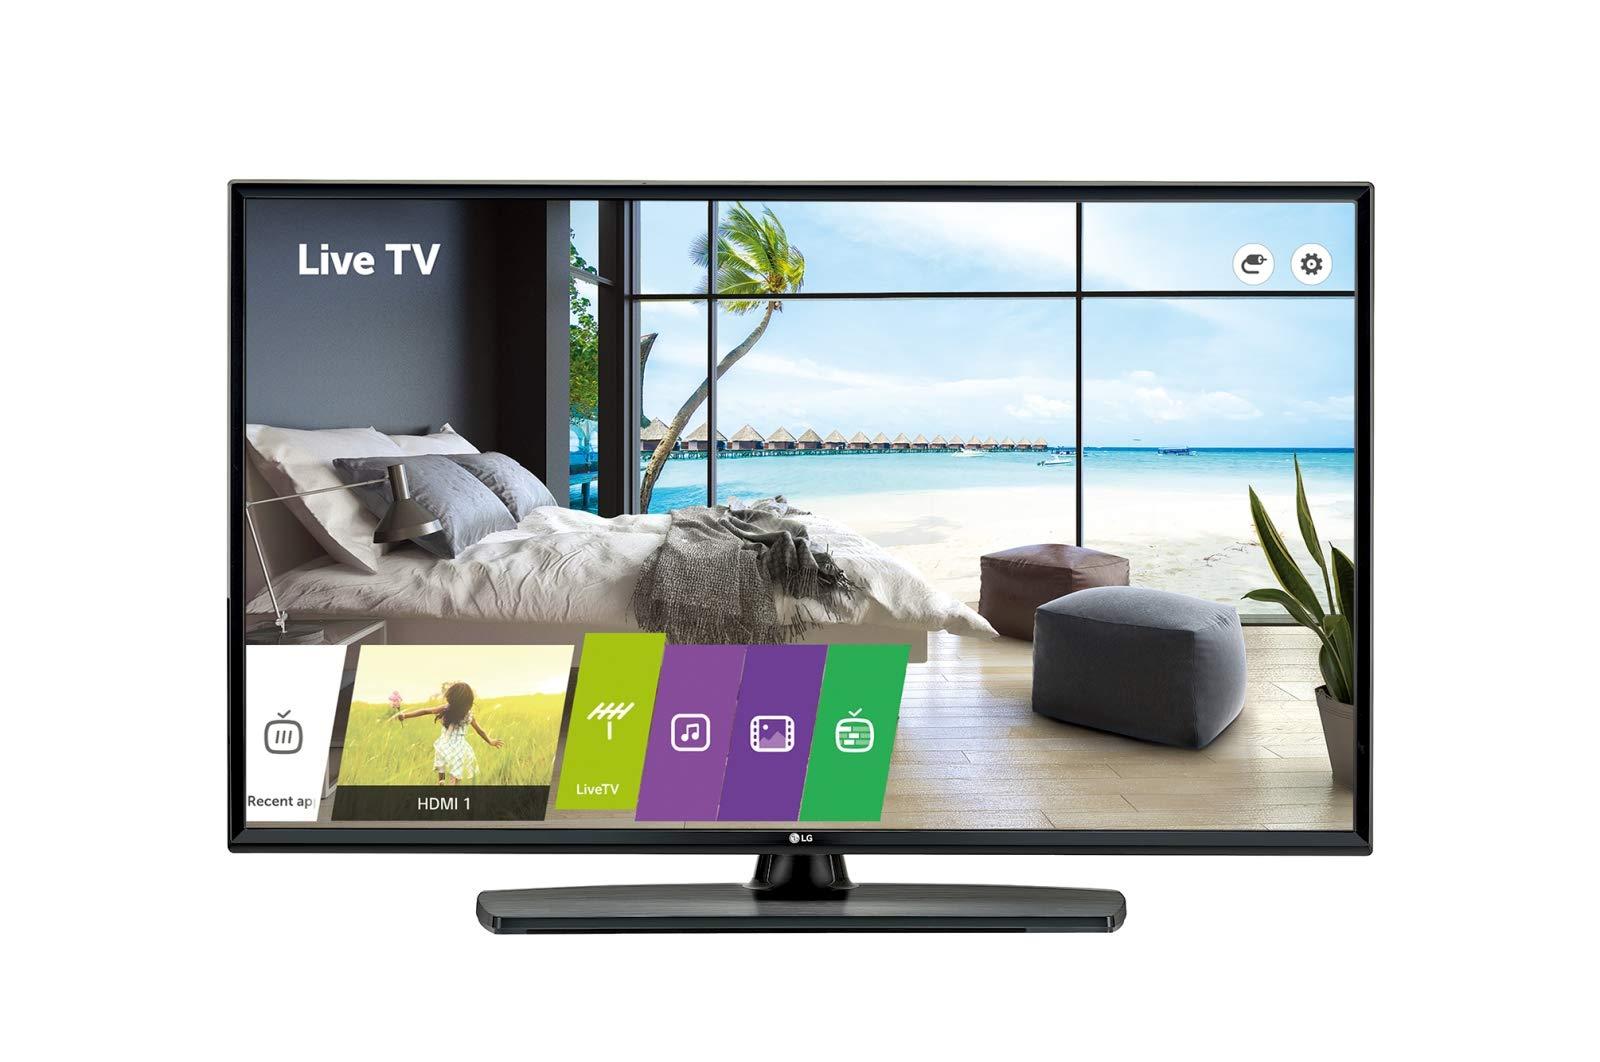 LG 43UU661H hospitality TV 109.2 cm (43